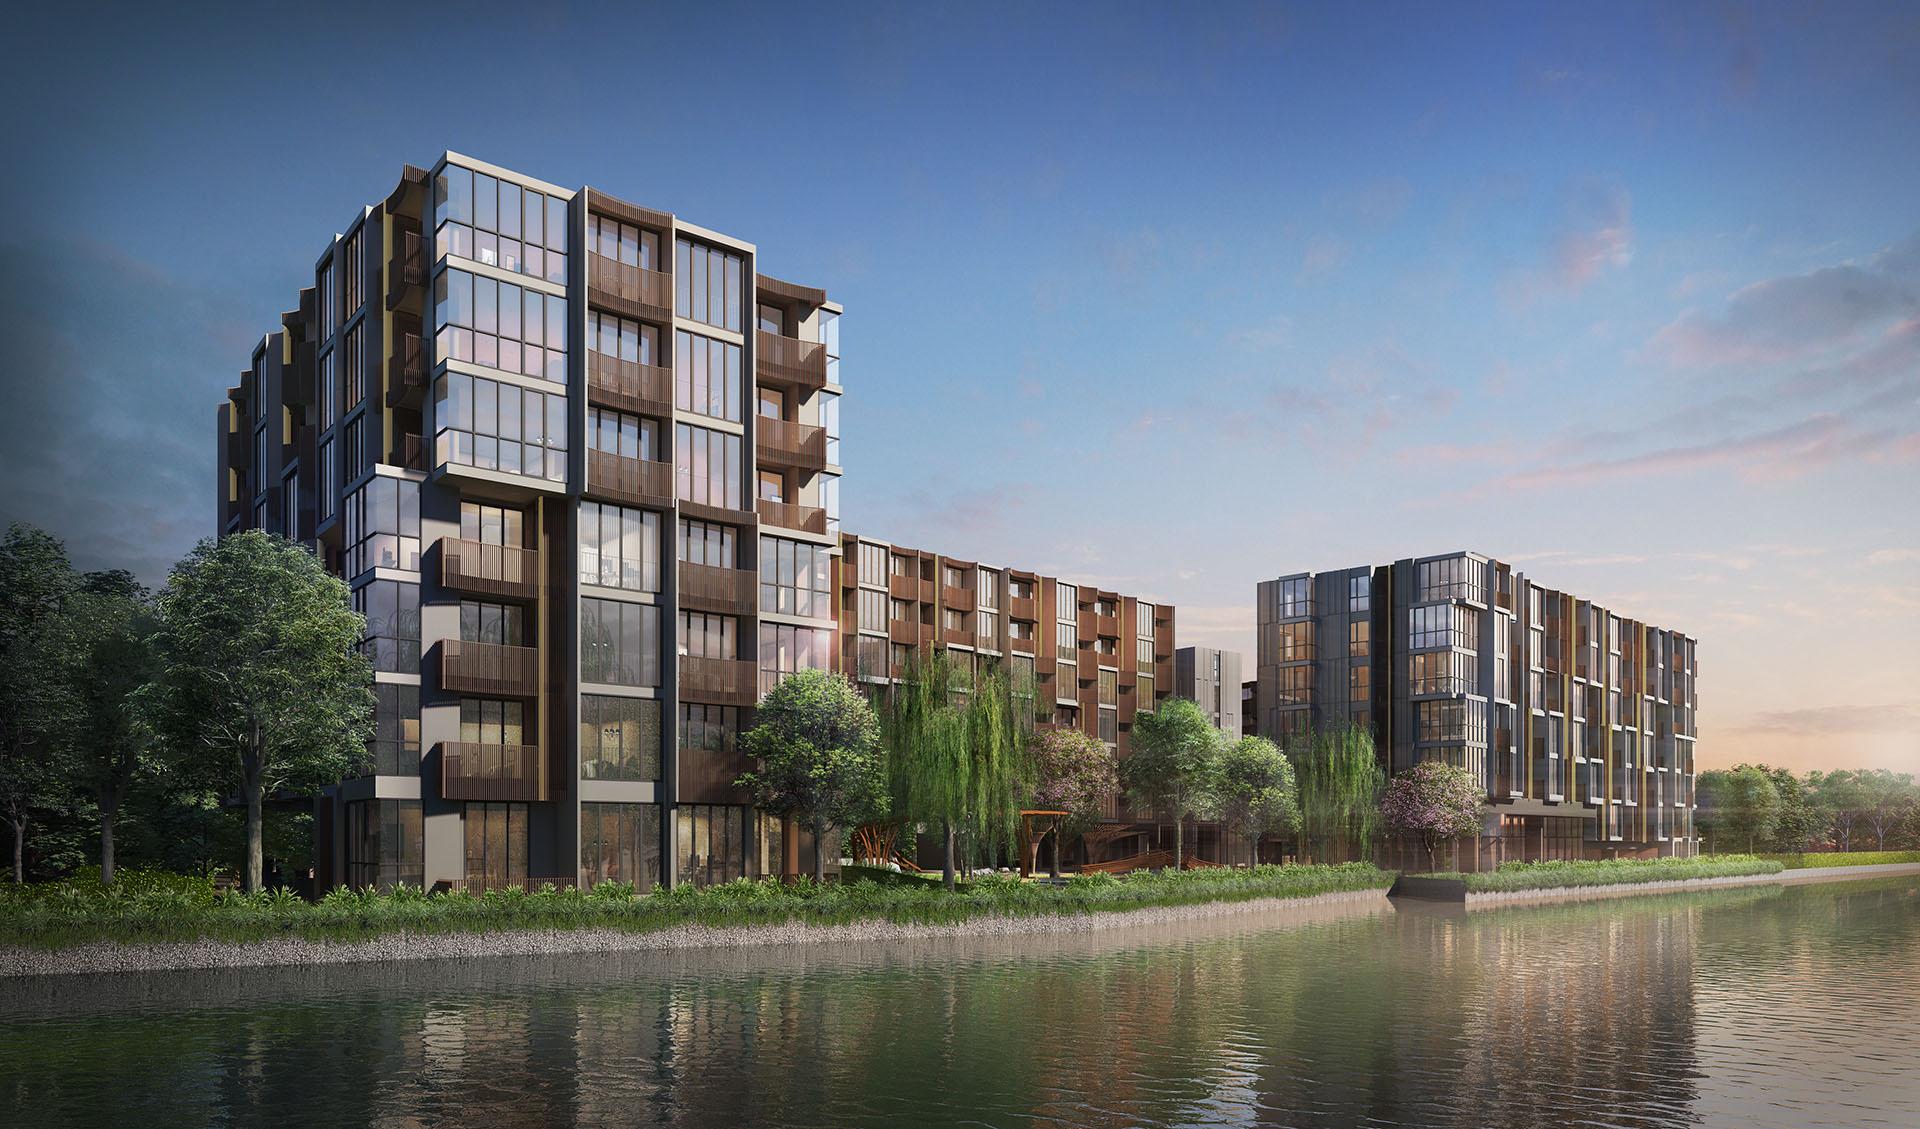 kawa haus l condominium in bangkok l sansiri. Black Bedroom Furniture Sets. Home Design Ideas